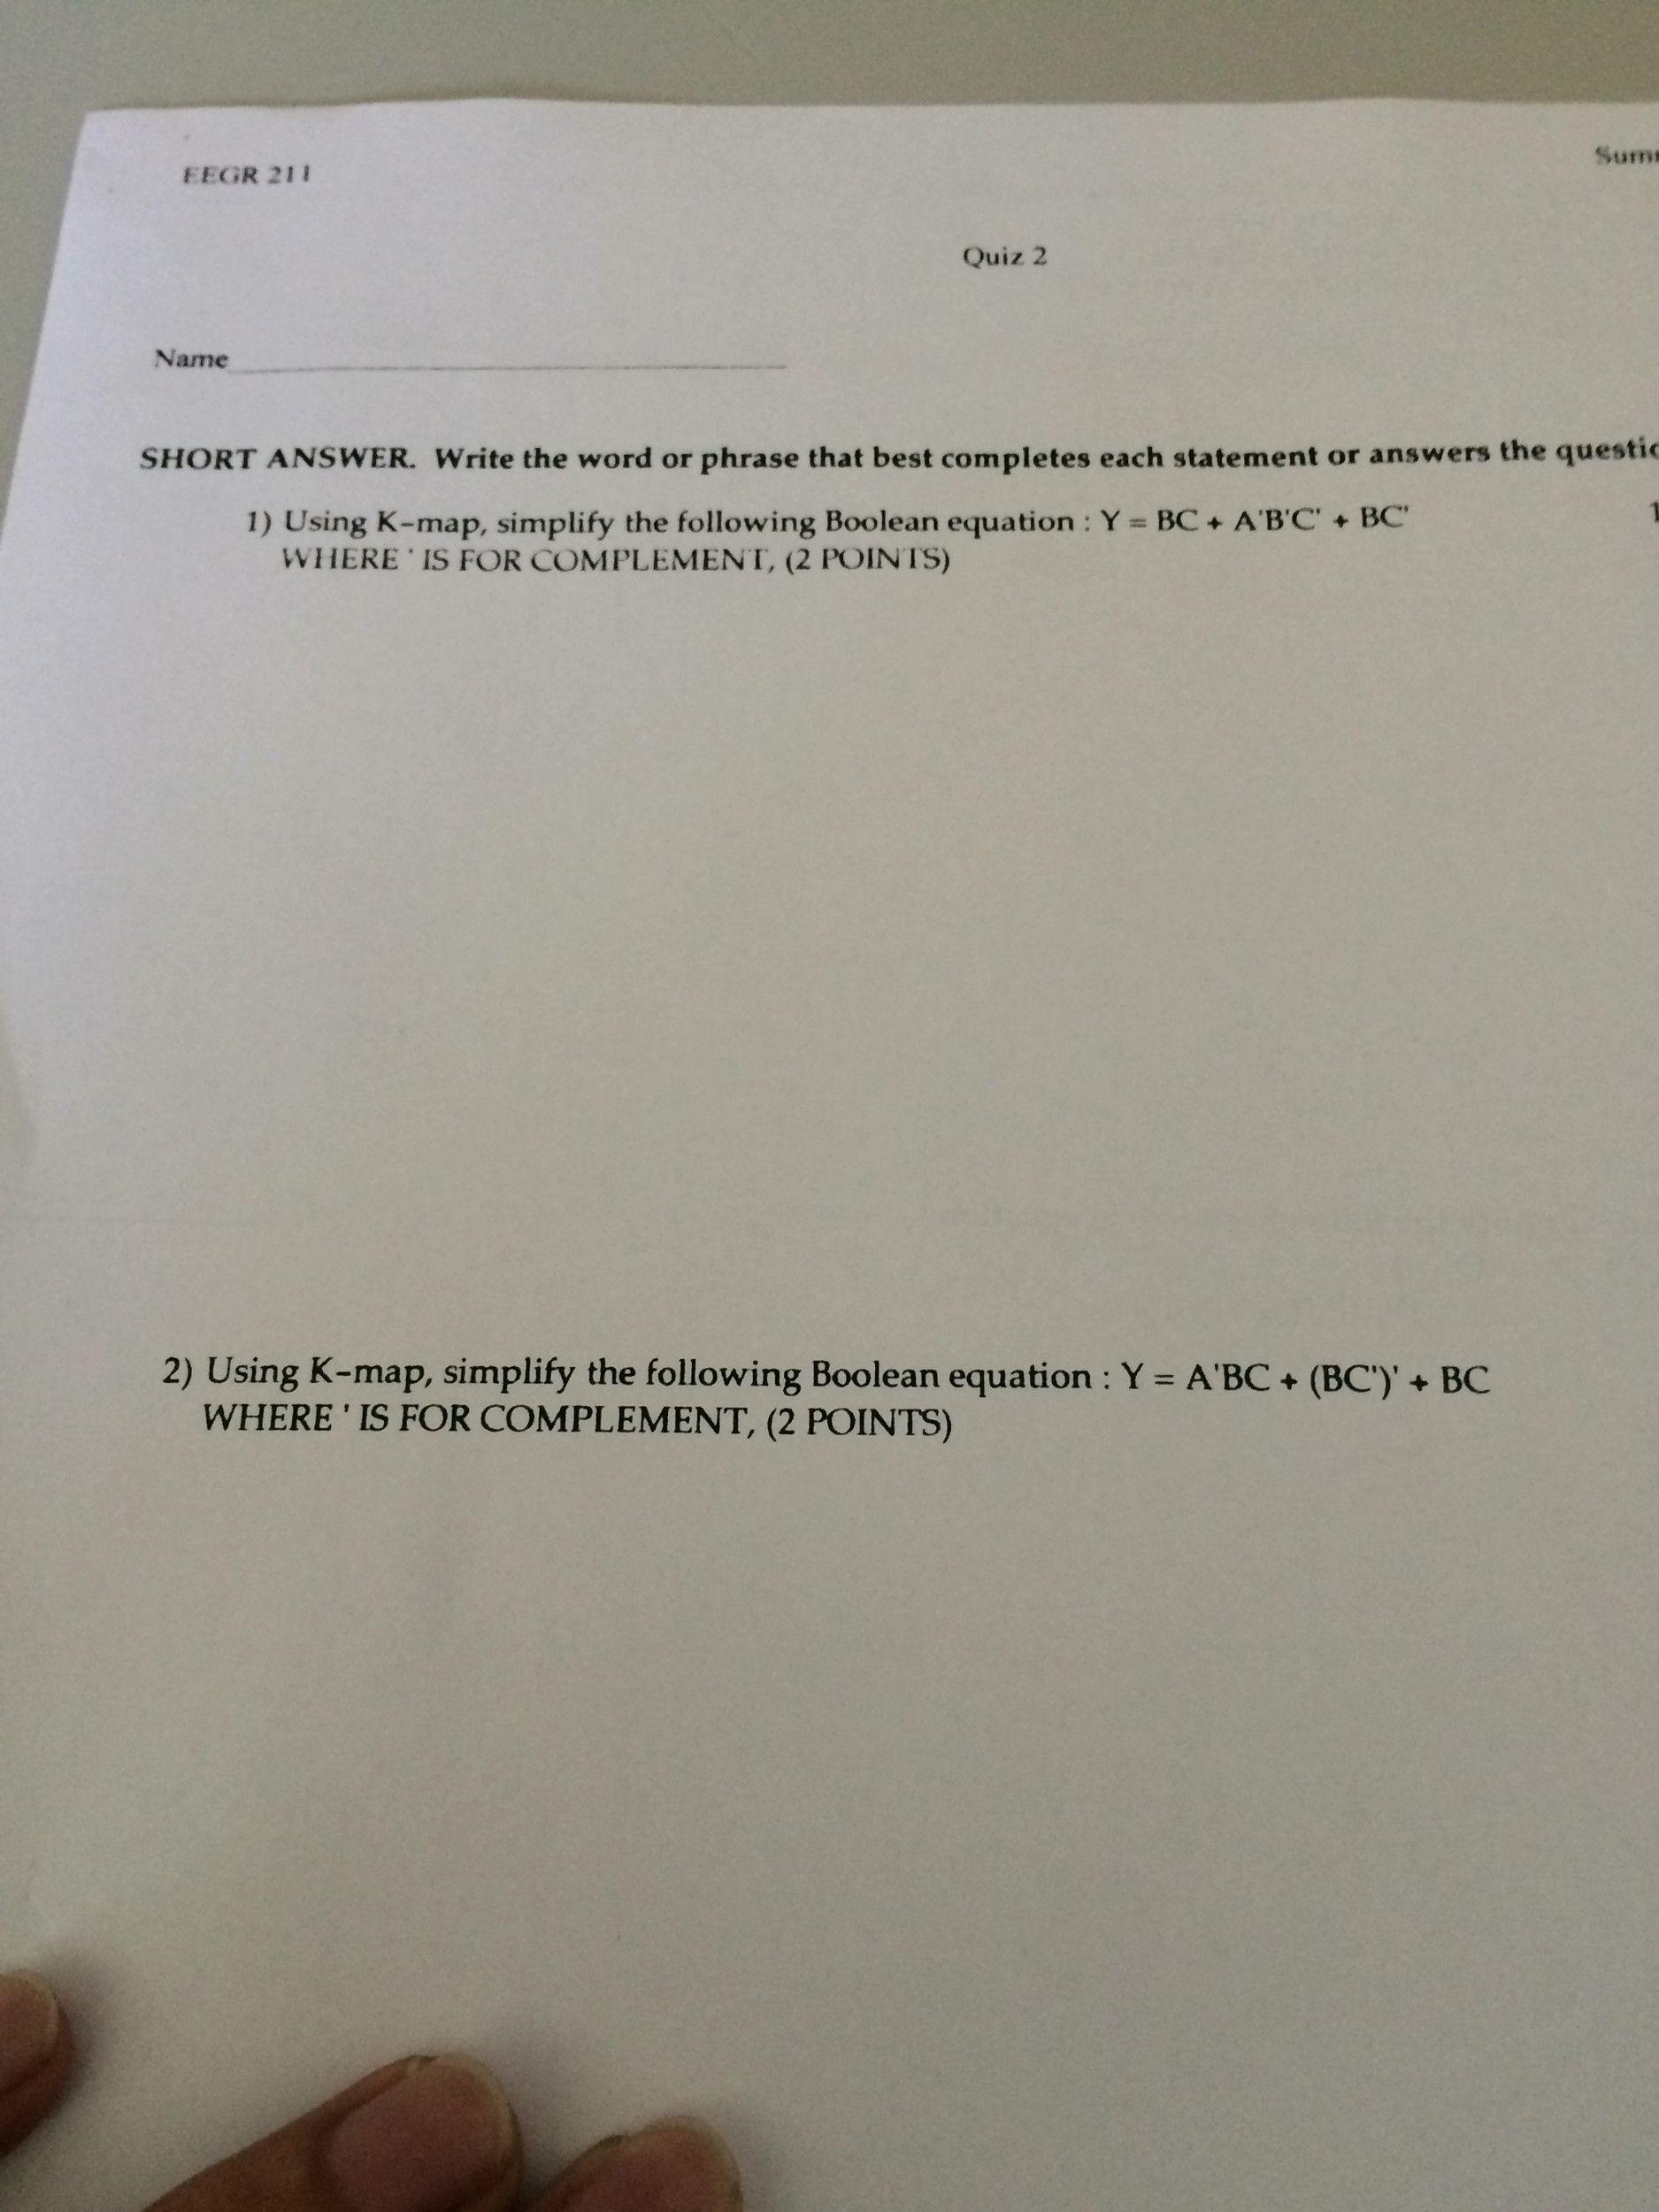 Worksheet Math Models Worksheet 41 Relations And Functions